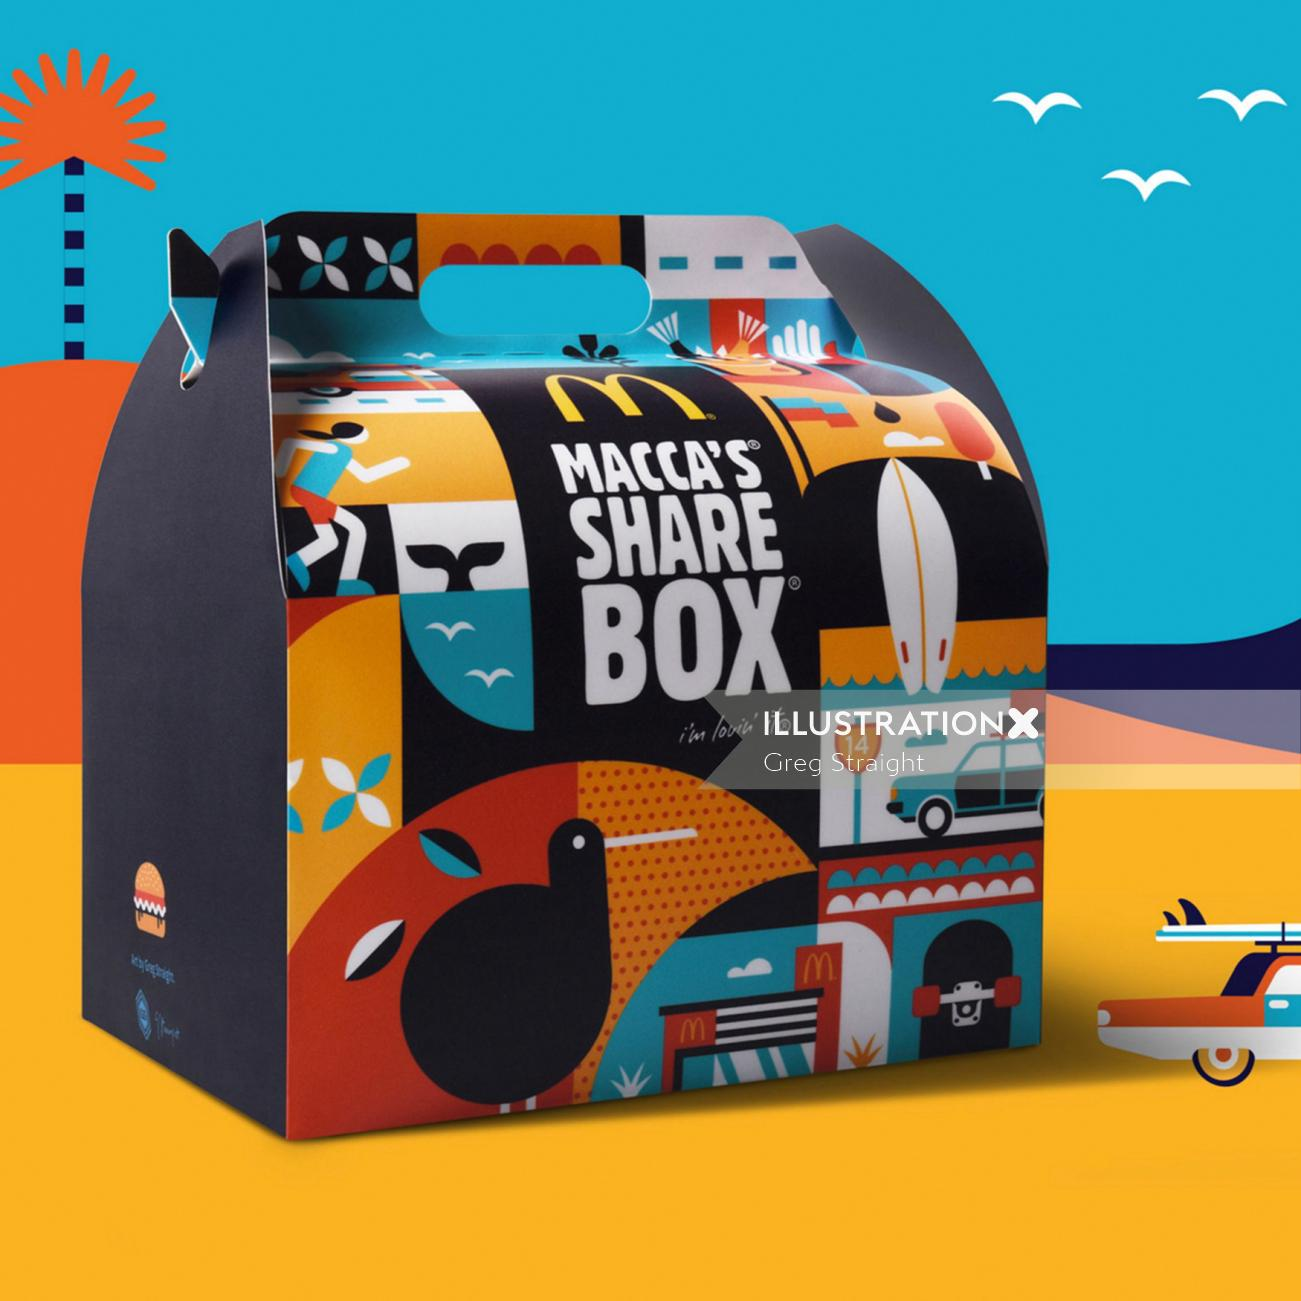 Conceptual illustration on box